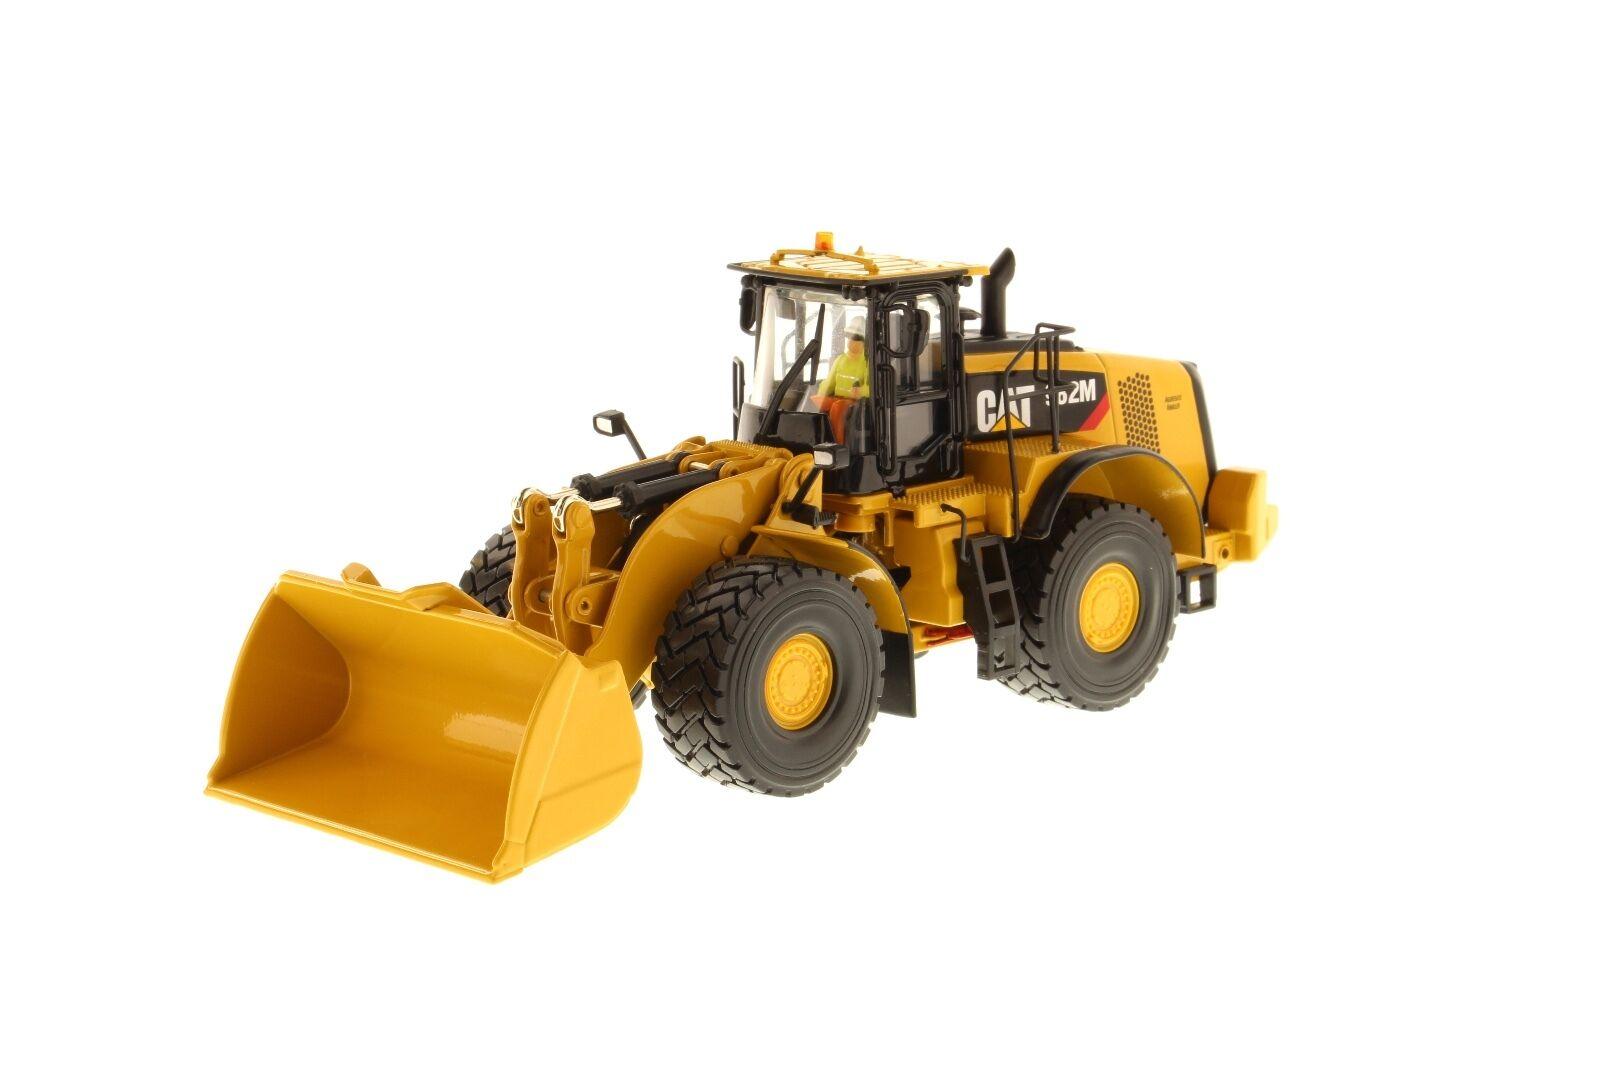 Caterpillar® 1 50 scale Cat 982M Wheel Loader - Diecast Masters 85292